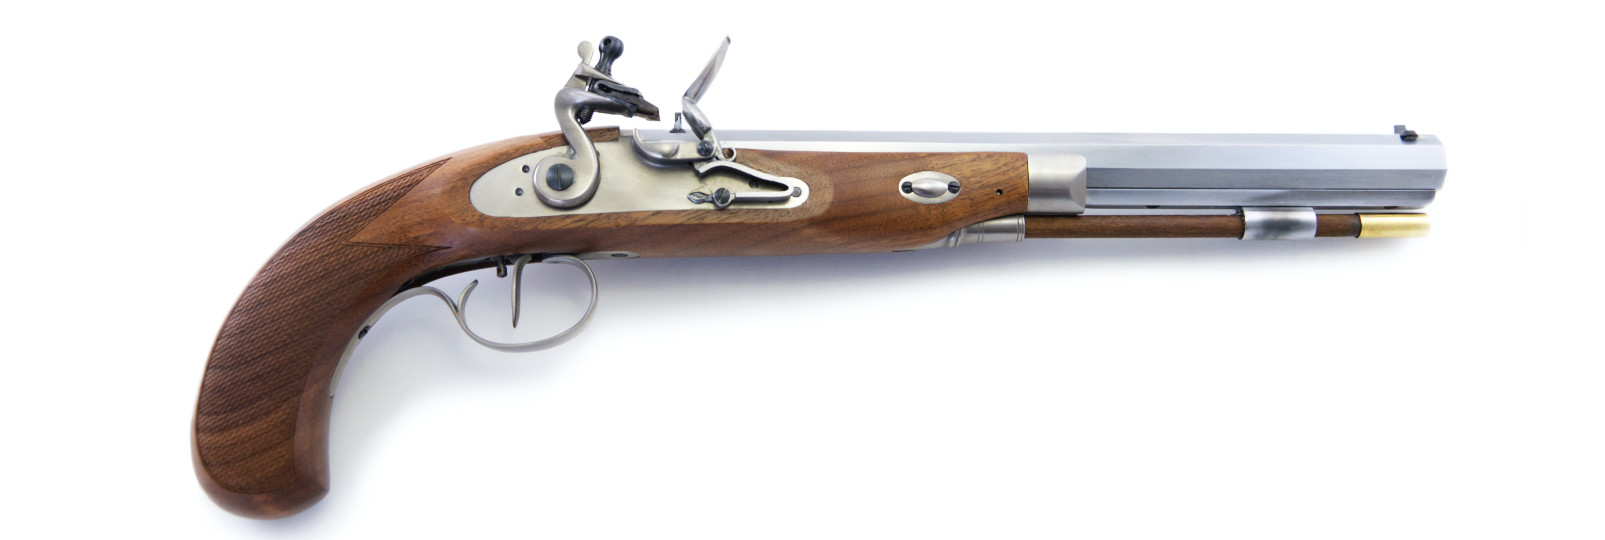 Pistola Charles Moore Target a pietra focaia